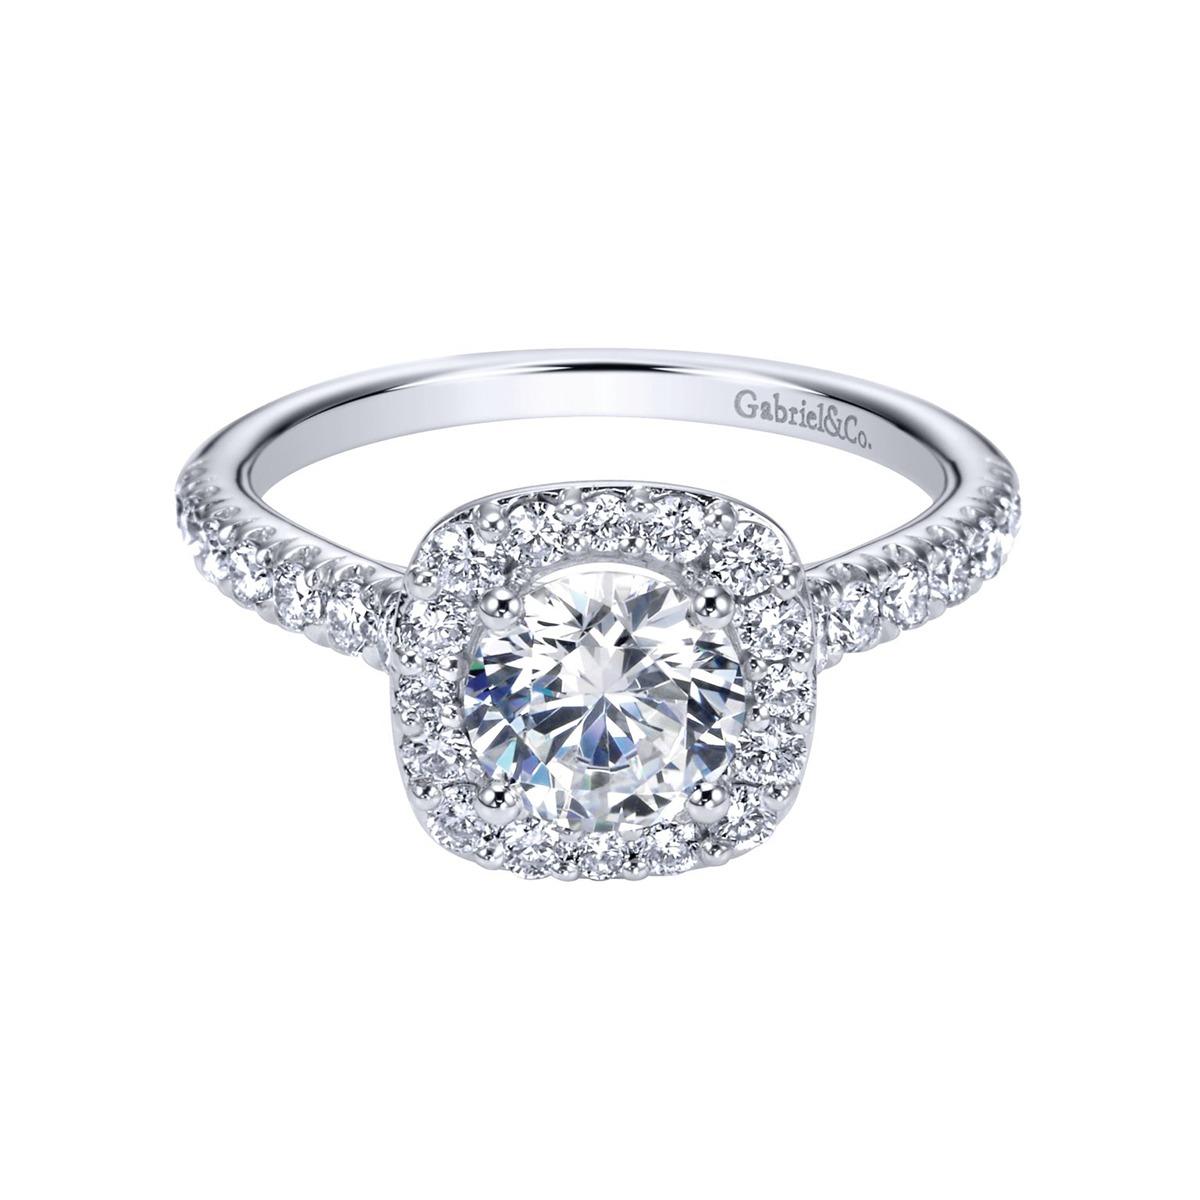 Gabriel Lyla 14k White Gold Round Halo Diamond Engagement Ring Little Treasury